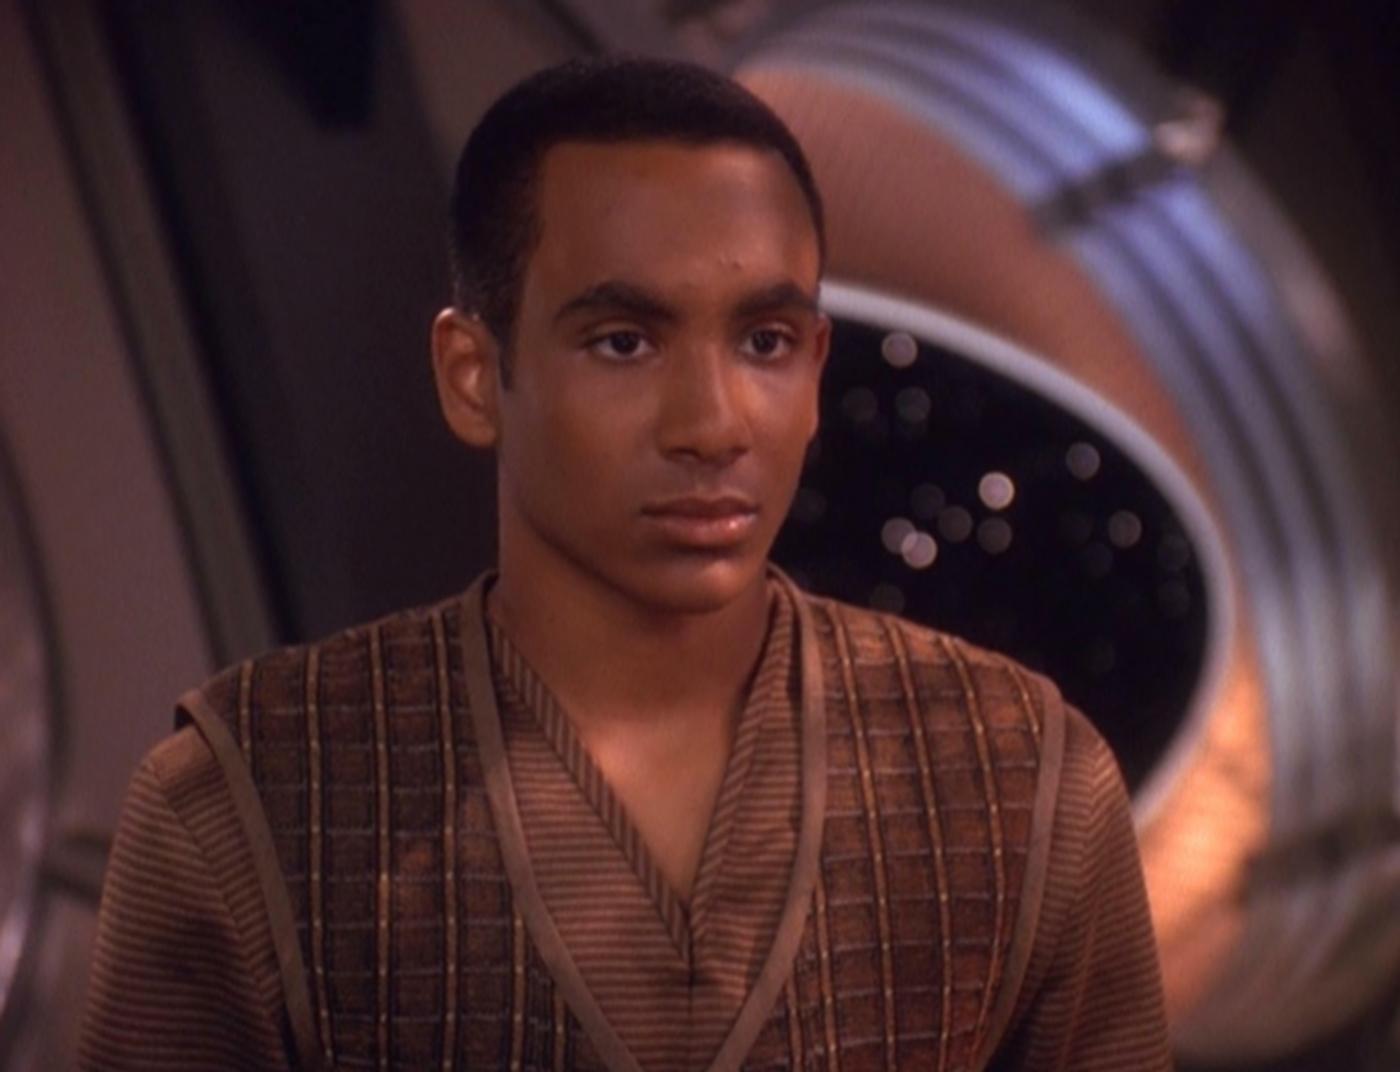 Cirroc Lofton plays Jake Sisko in Deep Space Nine